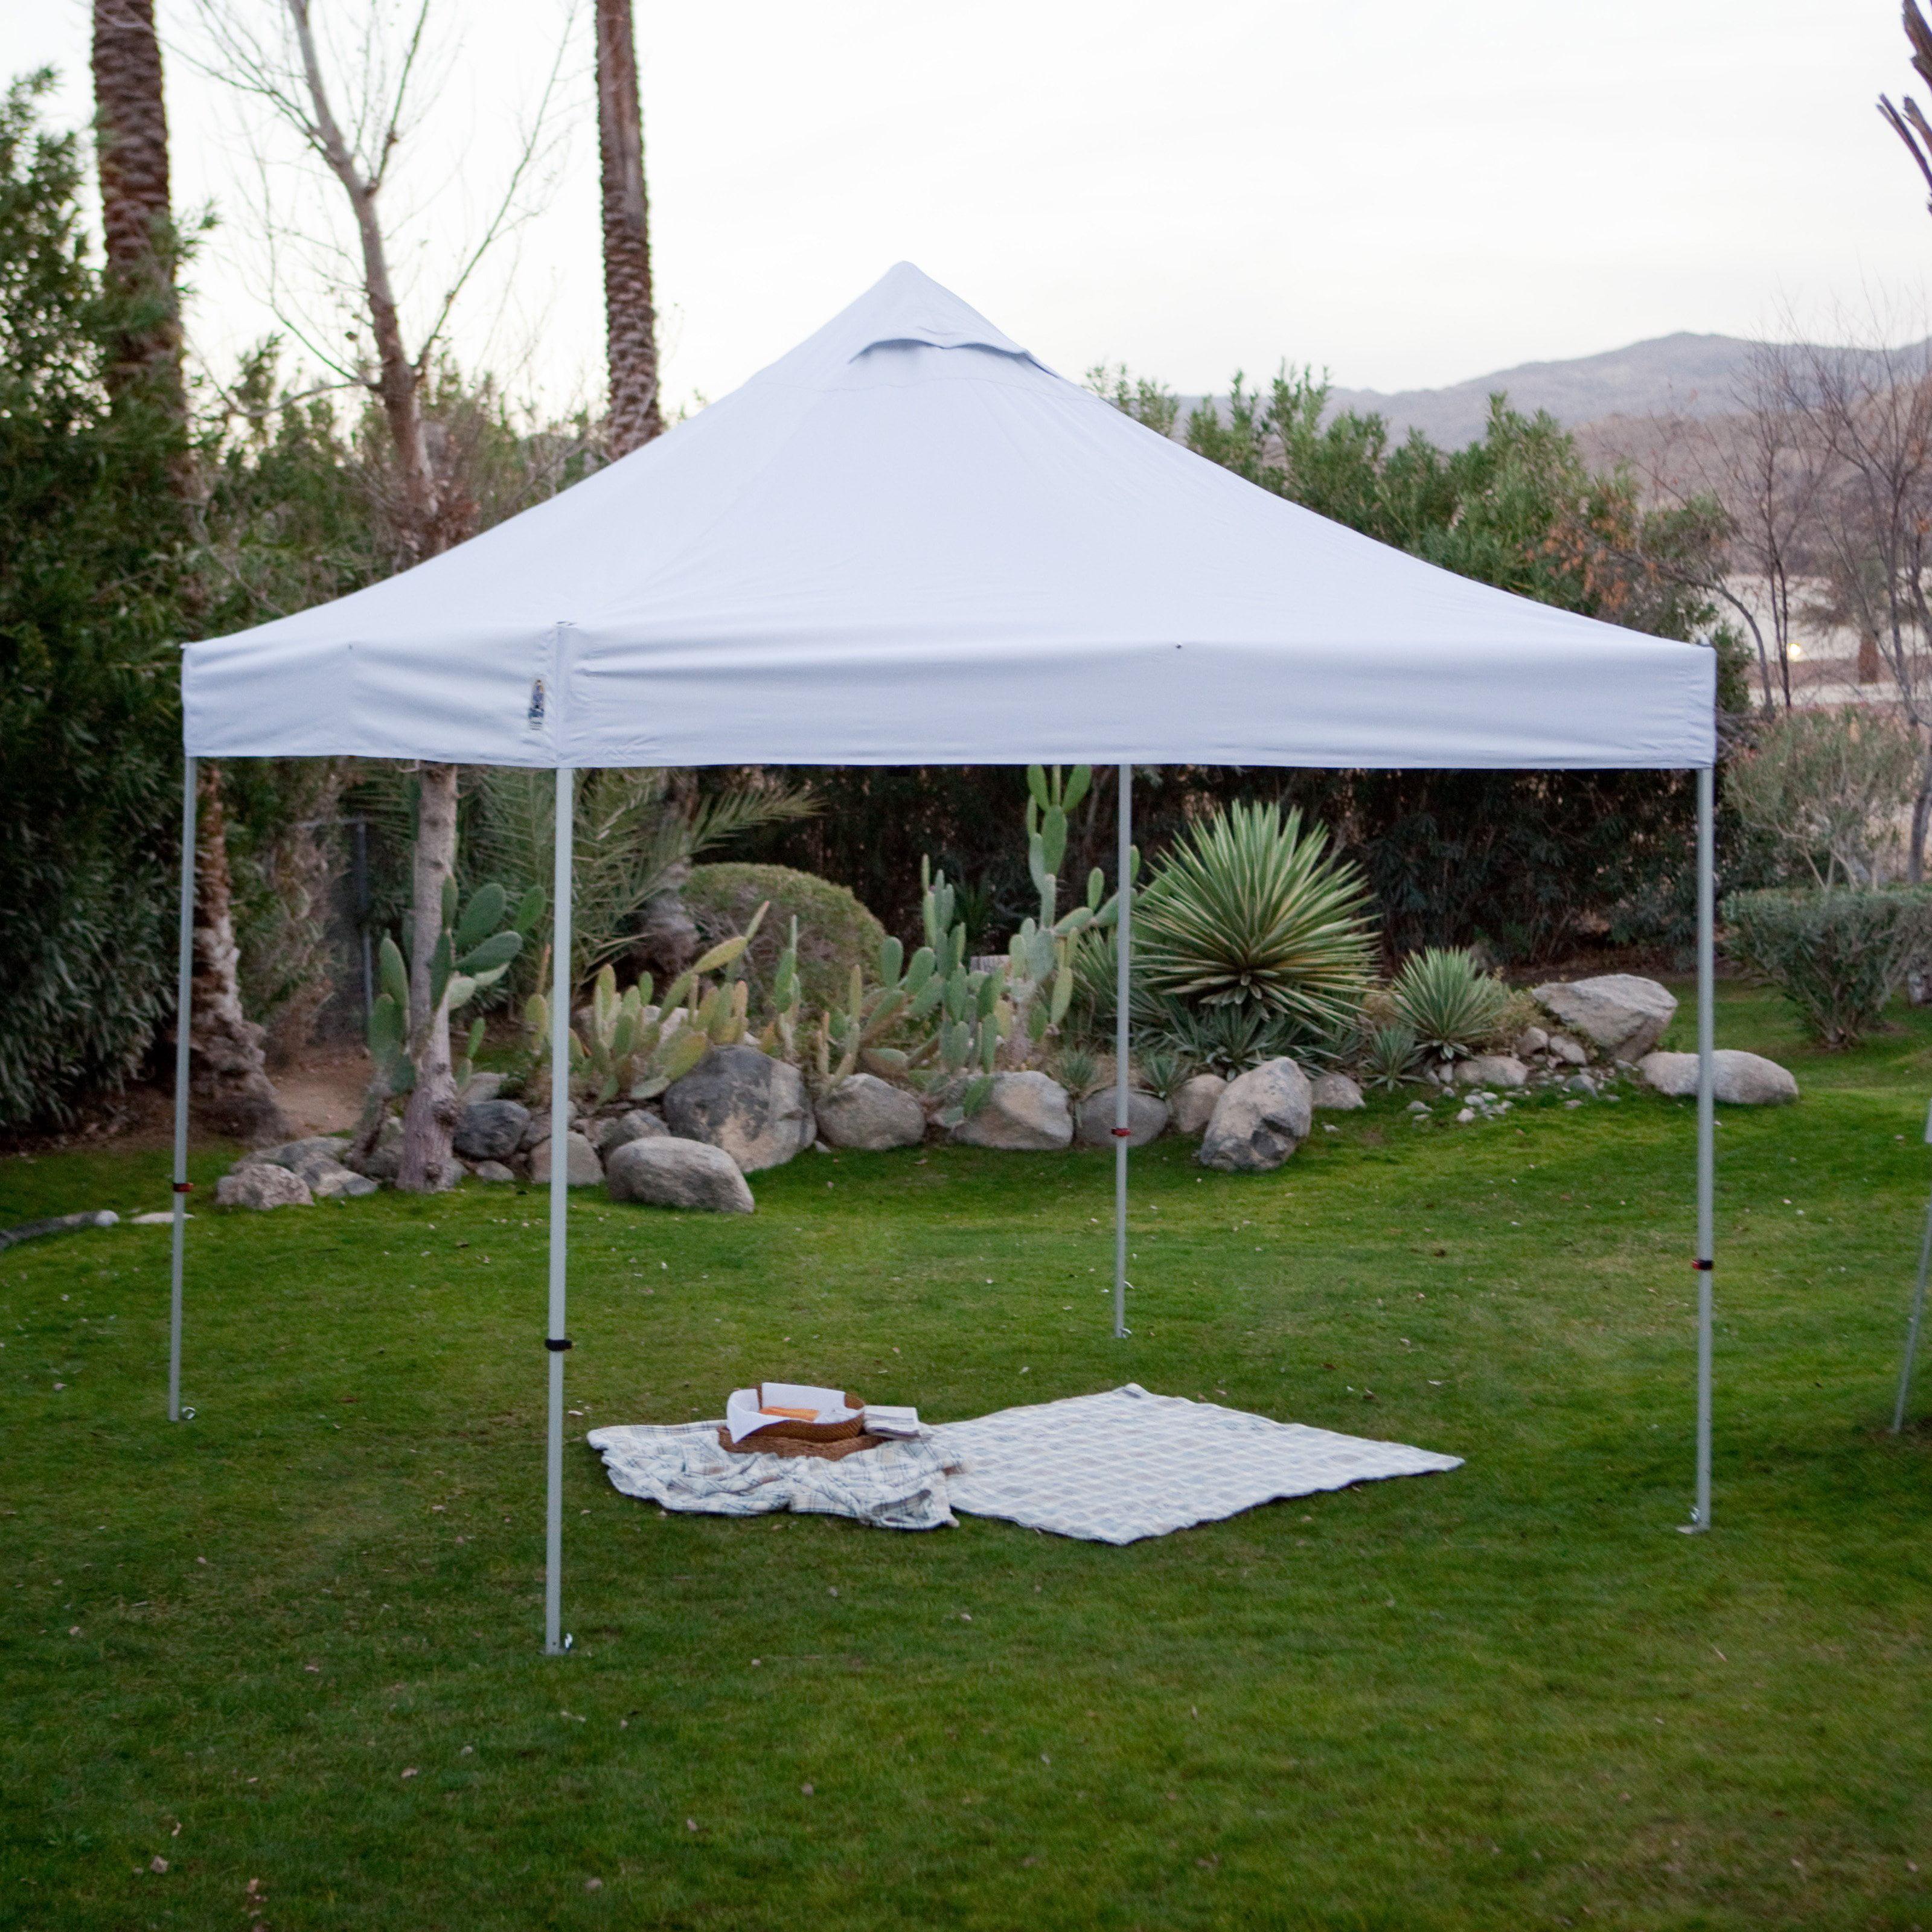 UnderCover; 10 x 10 ft. Super Lightweight Aluminum Instant Canopy